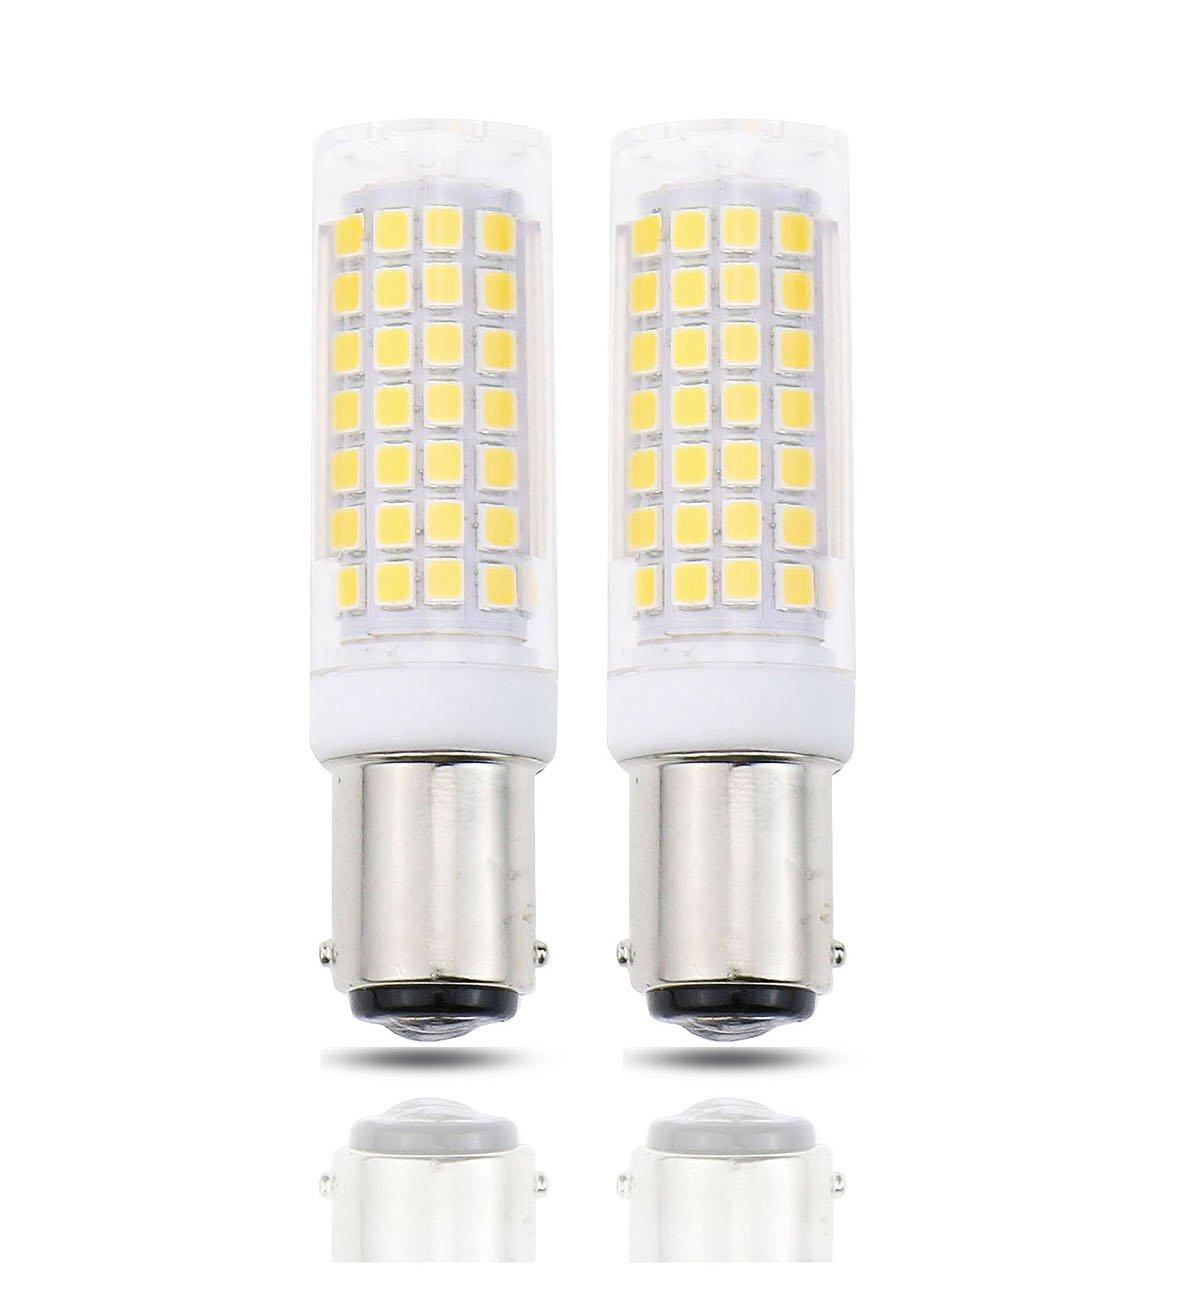 Lamsky BA15D LED Bulb,7 Watt 650 Lumens,70W Halogen Bulb Replacement,Warm White 3000K,Double Contact Bayonet Base,120V 220V Voltage Input,No Flicker,CRI>85(Pack of 2)